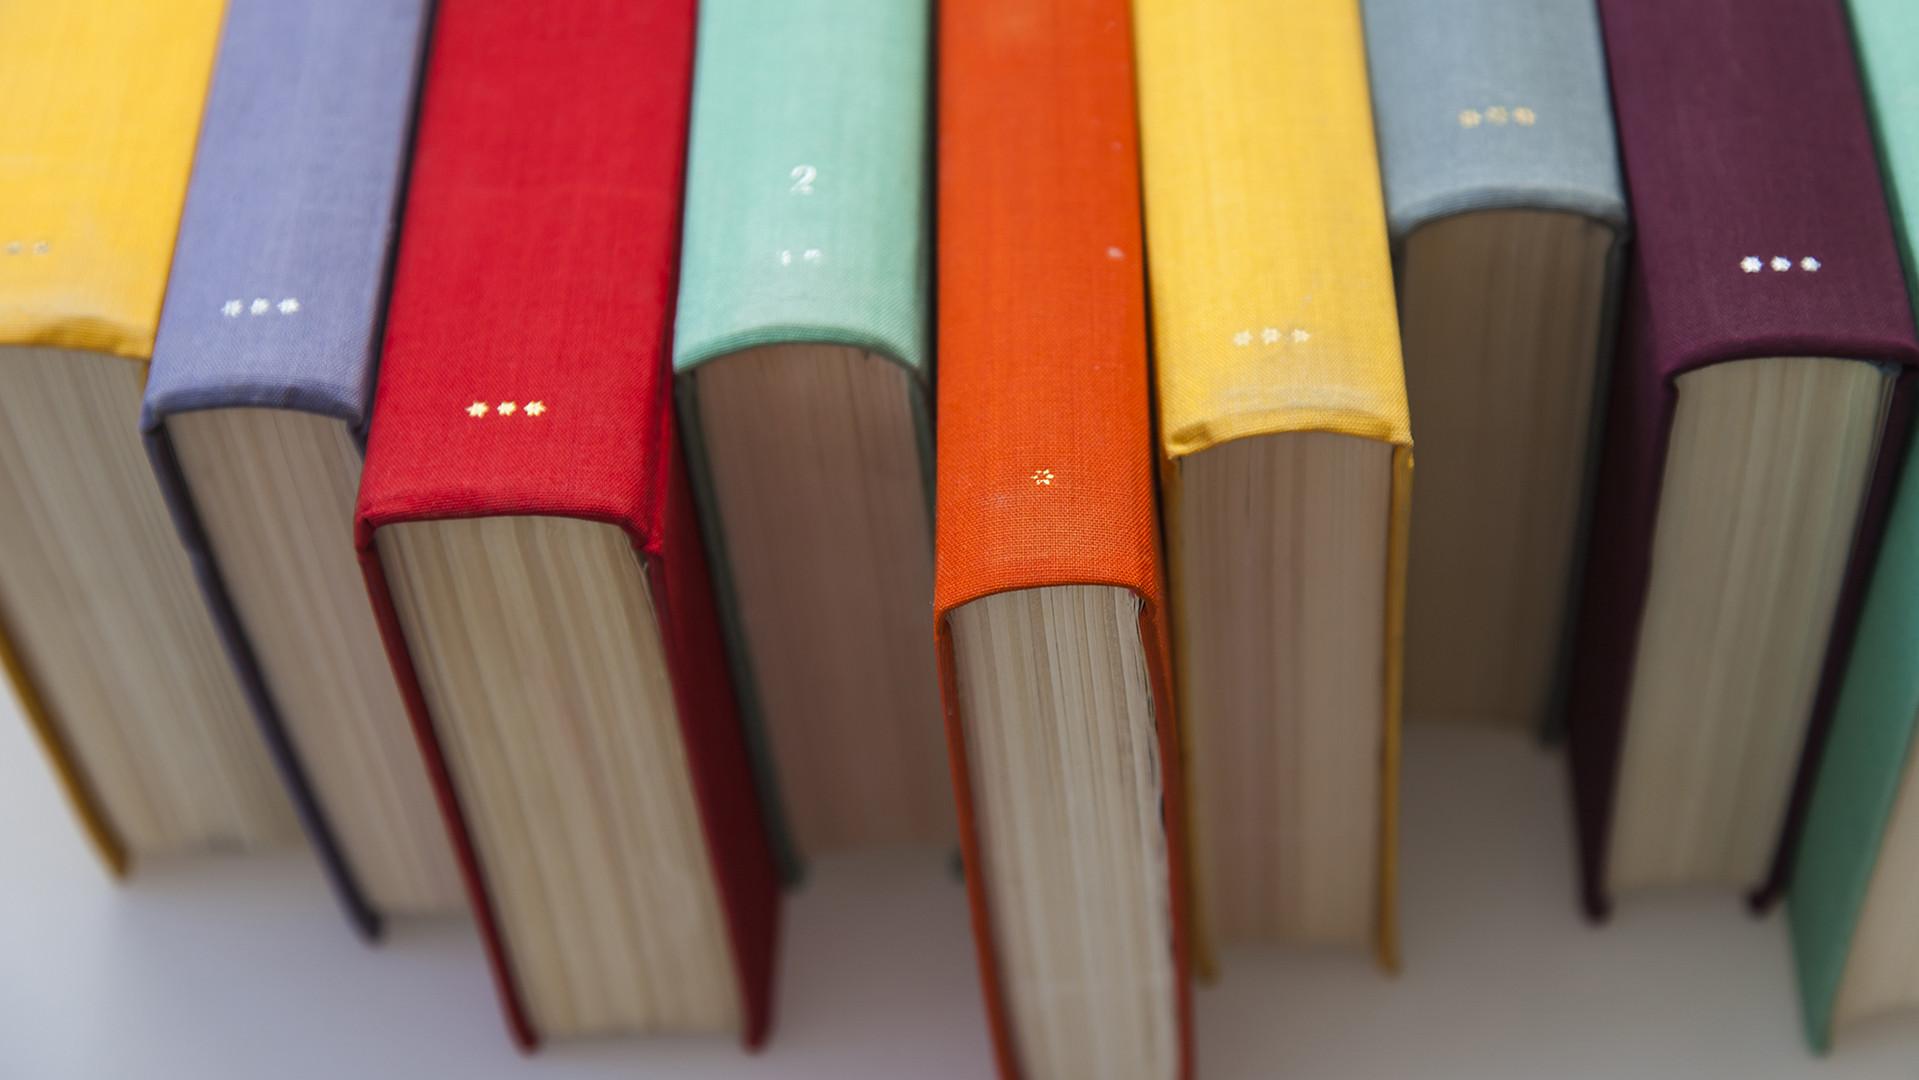 Author's Books